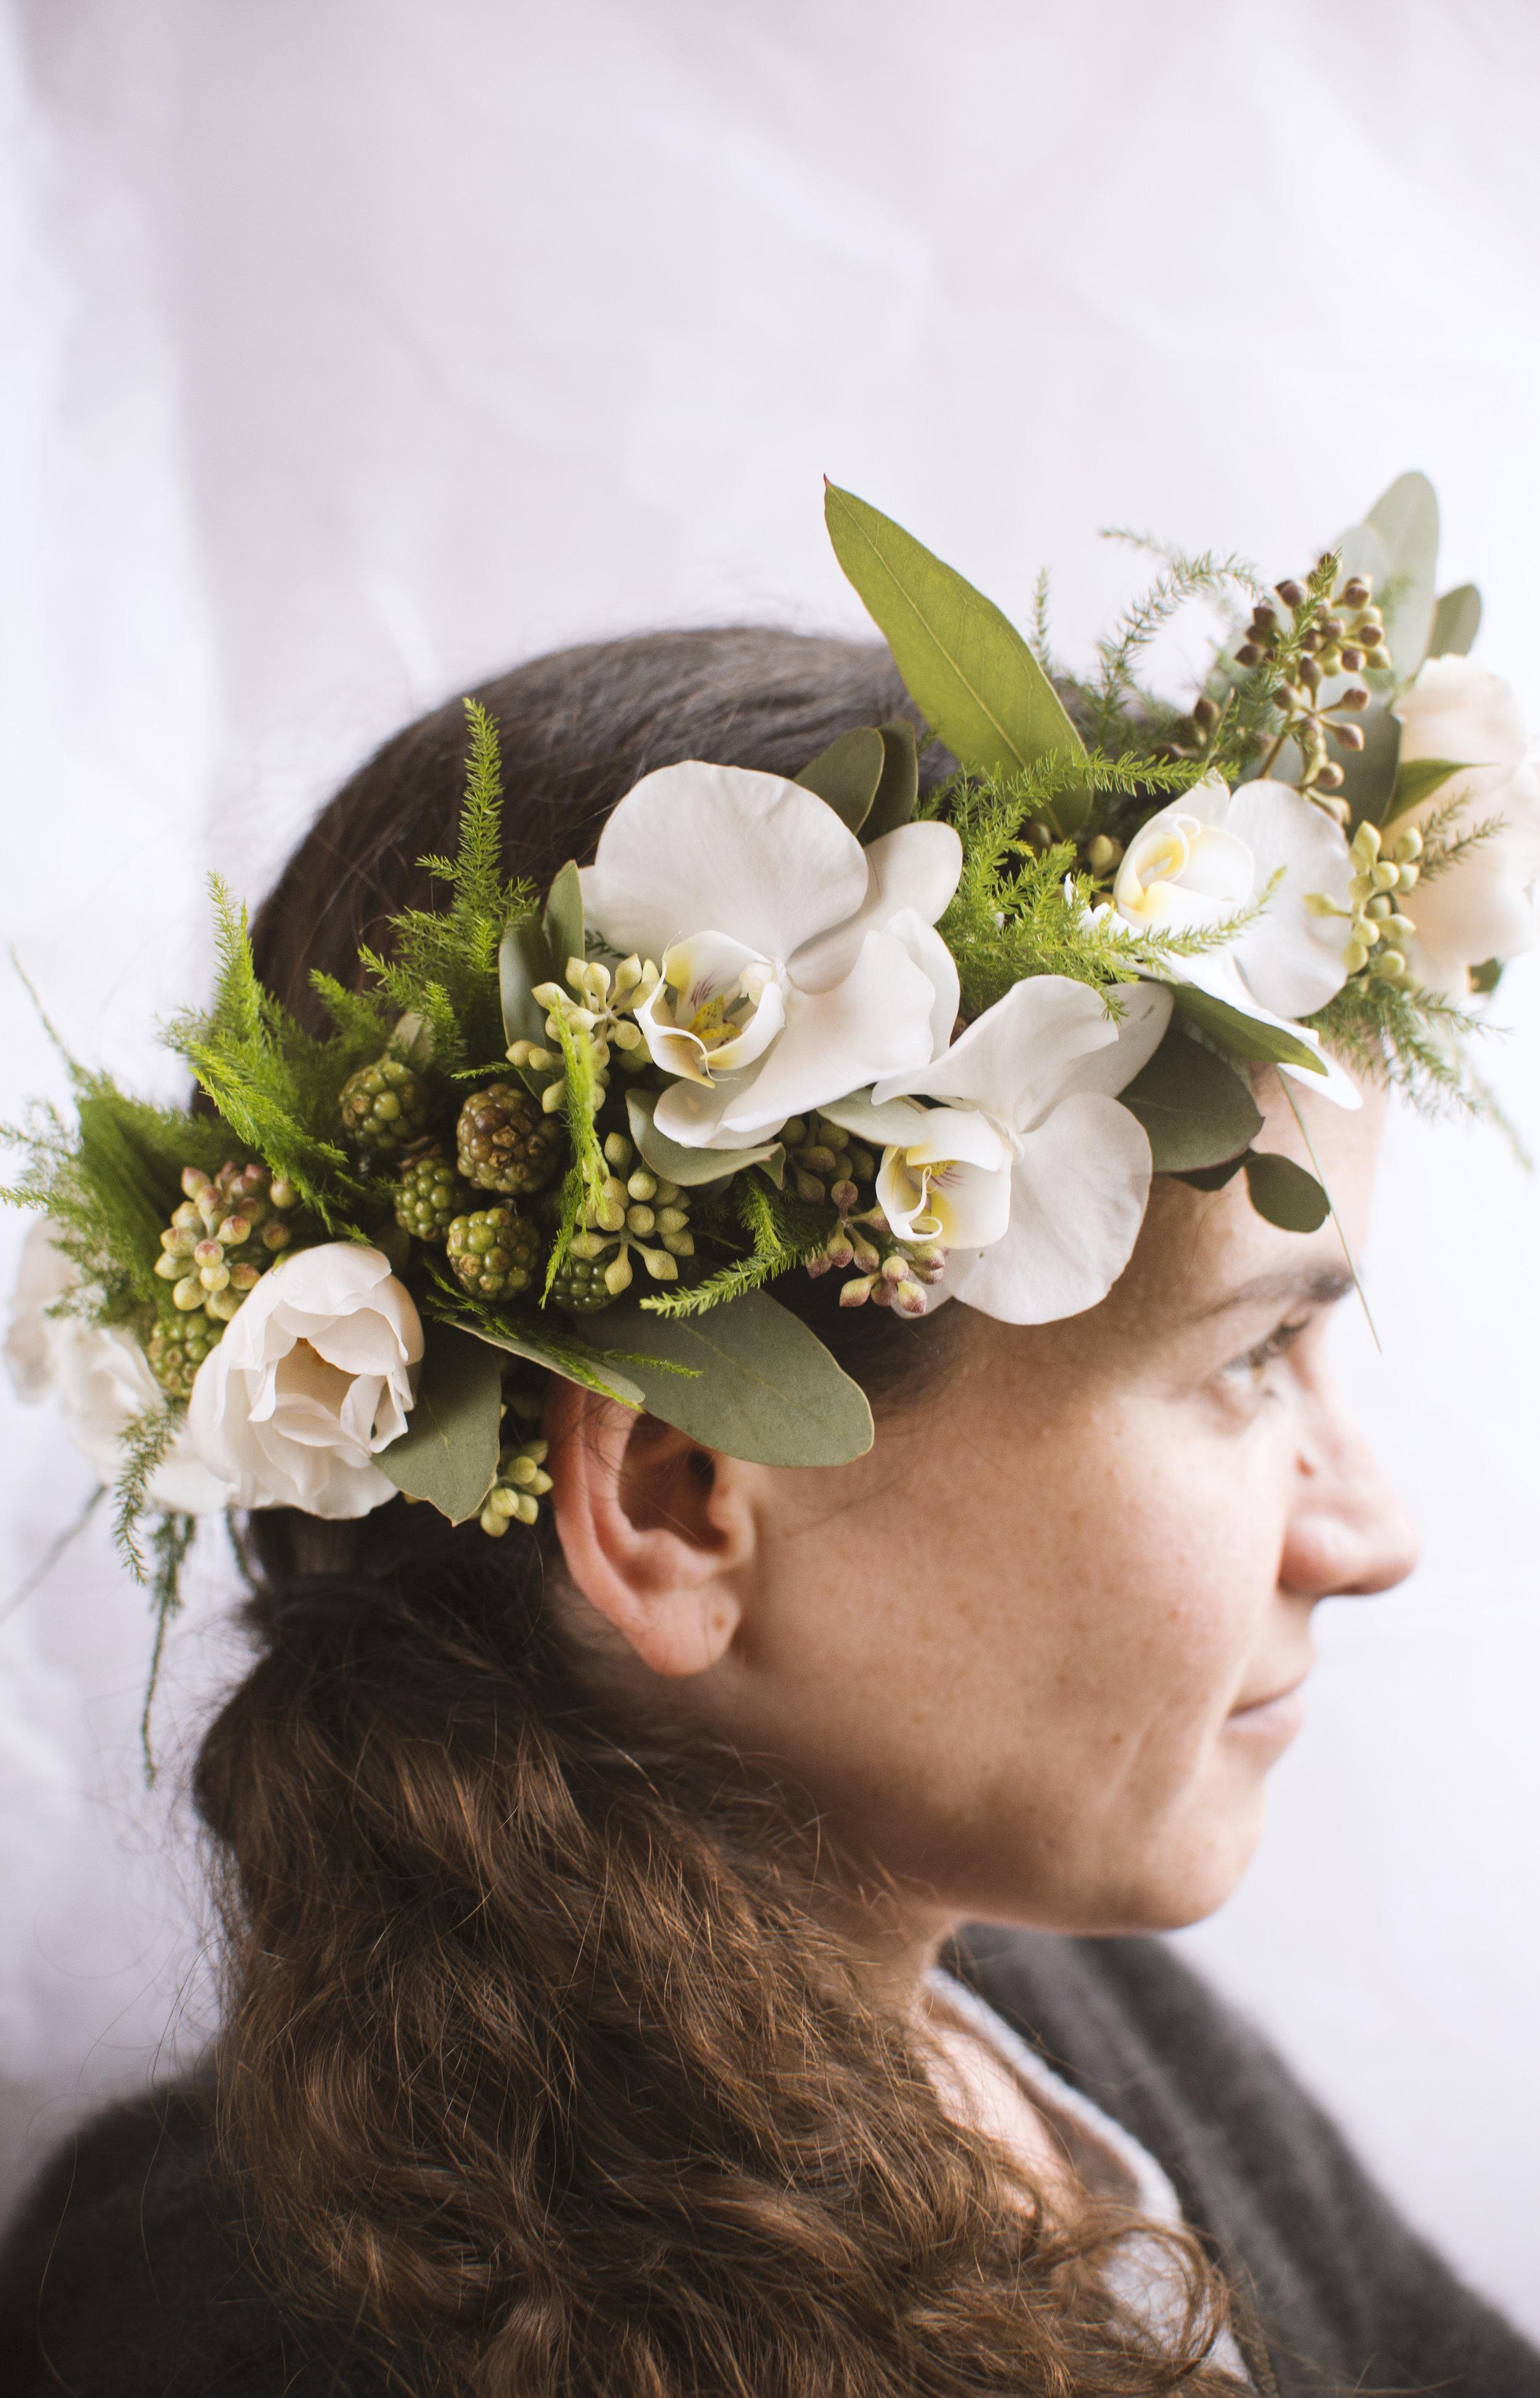 flower crown new orleans mitchs flowers flower cornet denys mertz florist flower shop bachelorete bride wedding celebratory.jpg